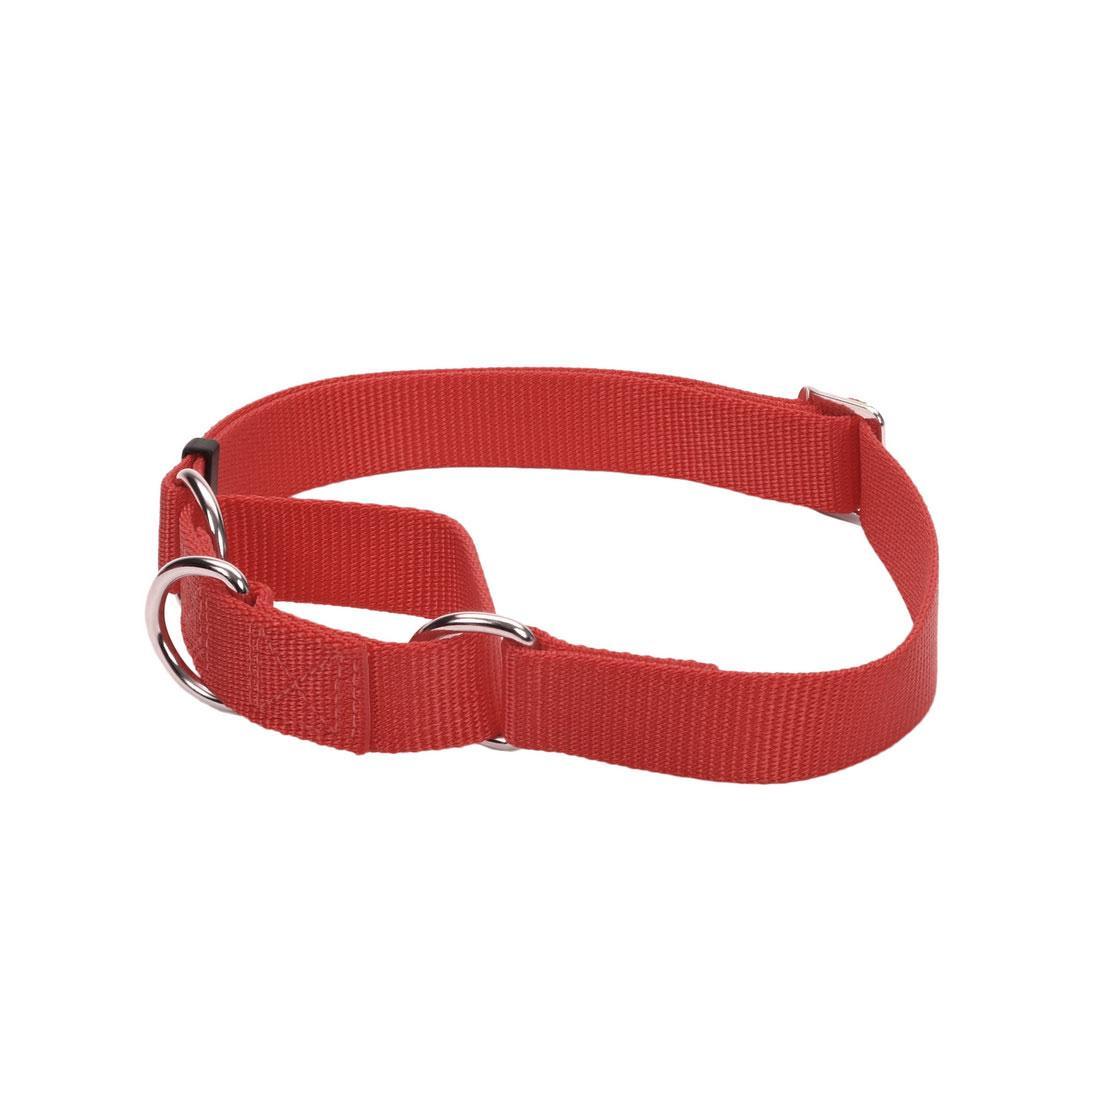 No! Slip Martingale Adjustable Dog Collar, Red Image